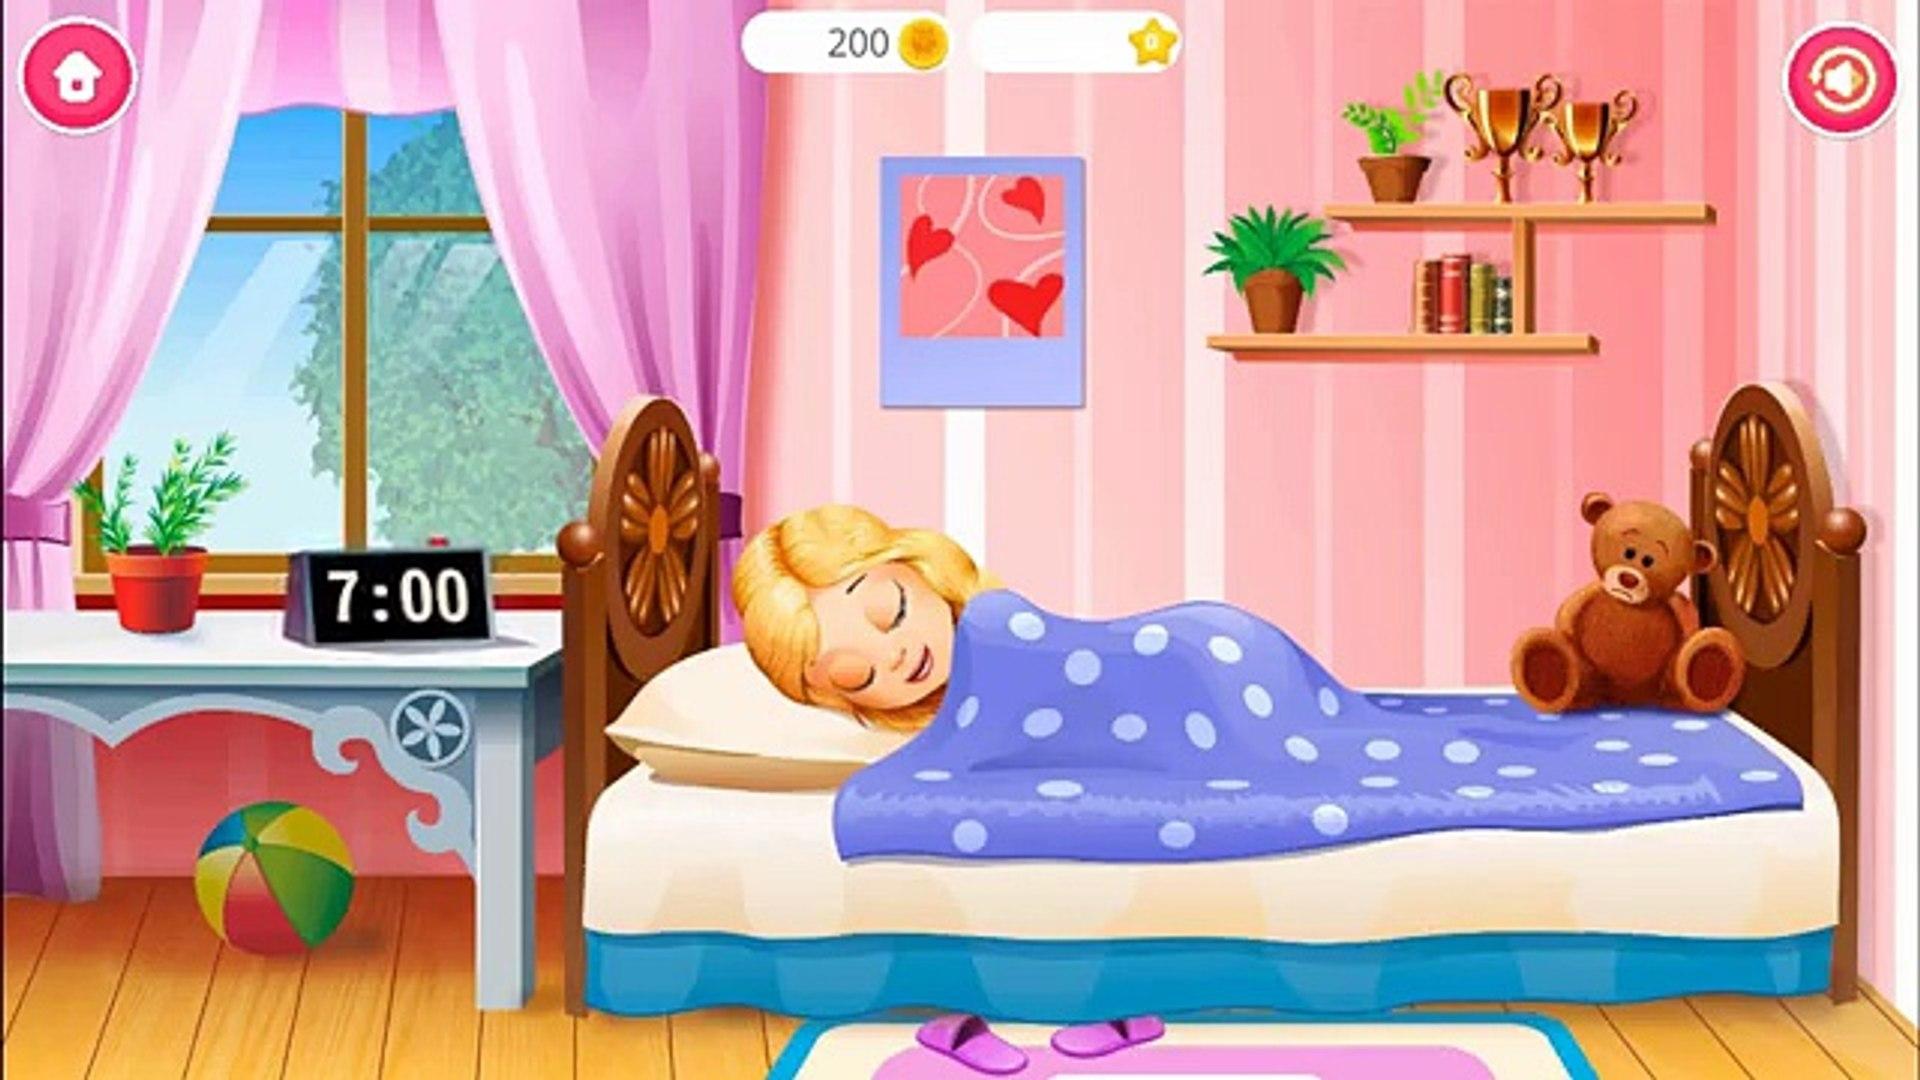 Play & Learn Kids Daily Routine - Bath Brush Teeth & Dress Up with Pretty Alice Daily Fun Ki